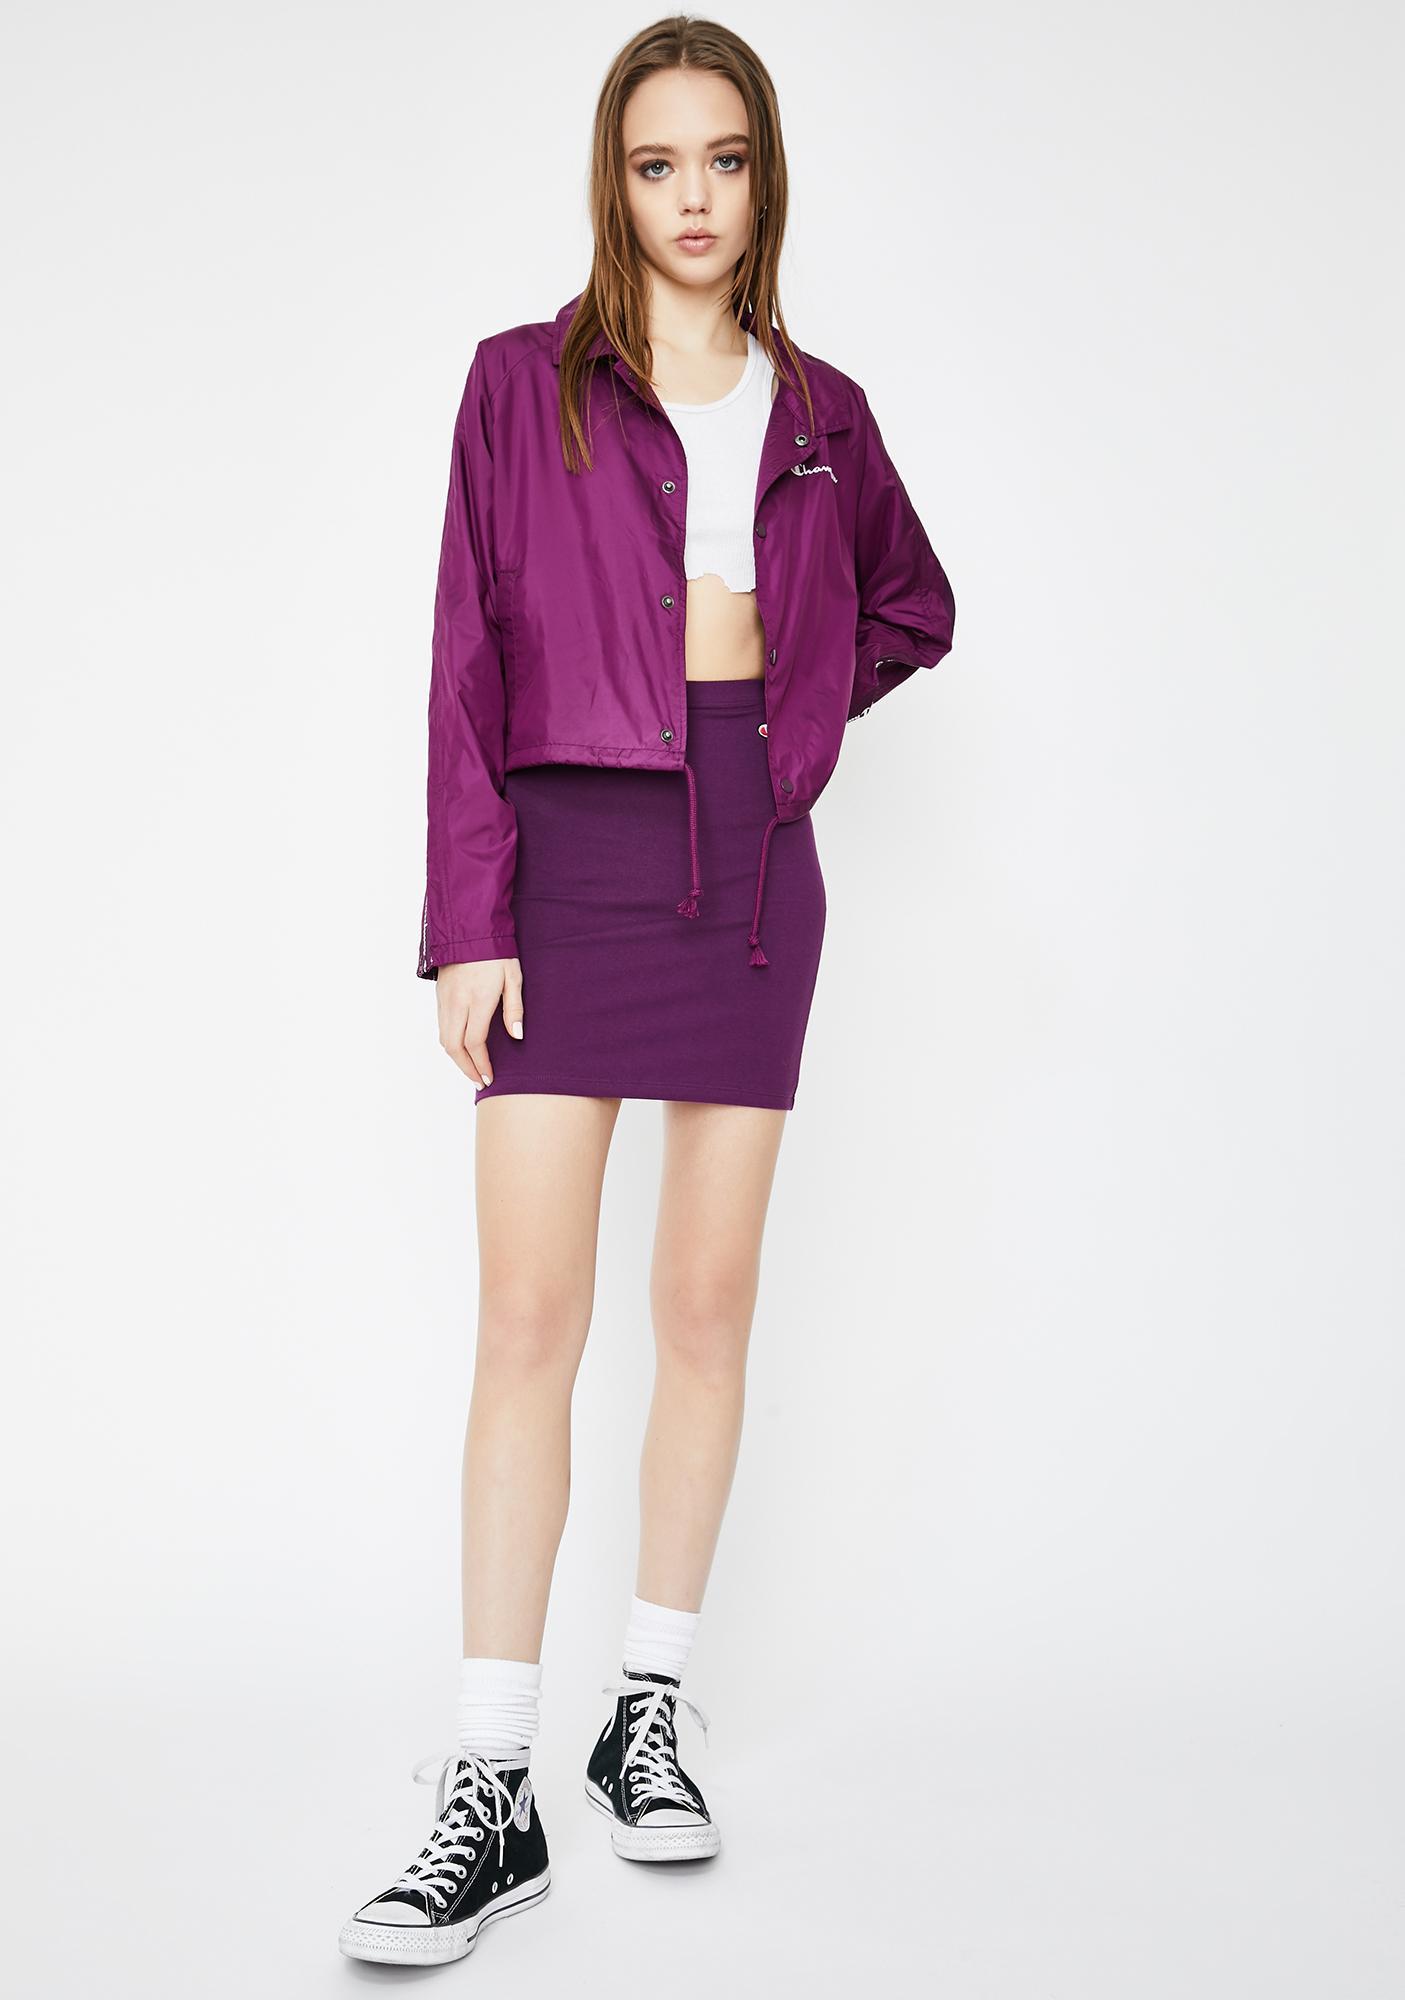 Champion Venetian Purple Cropped Coaches Jacket